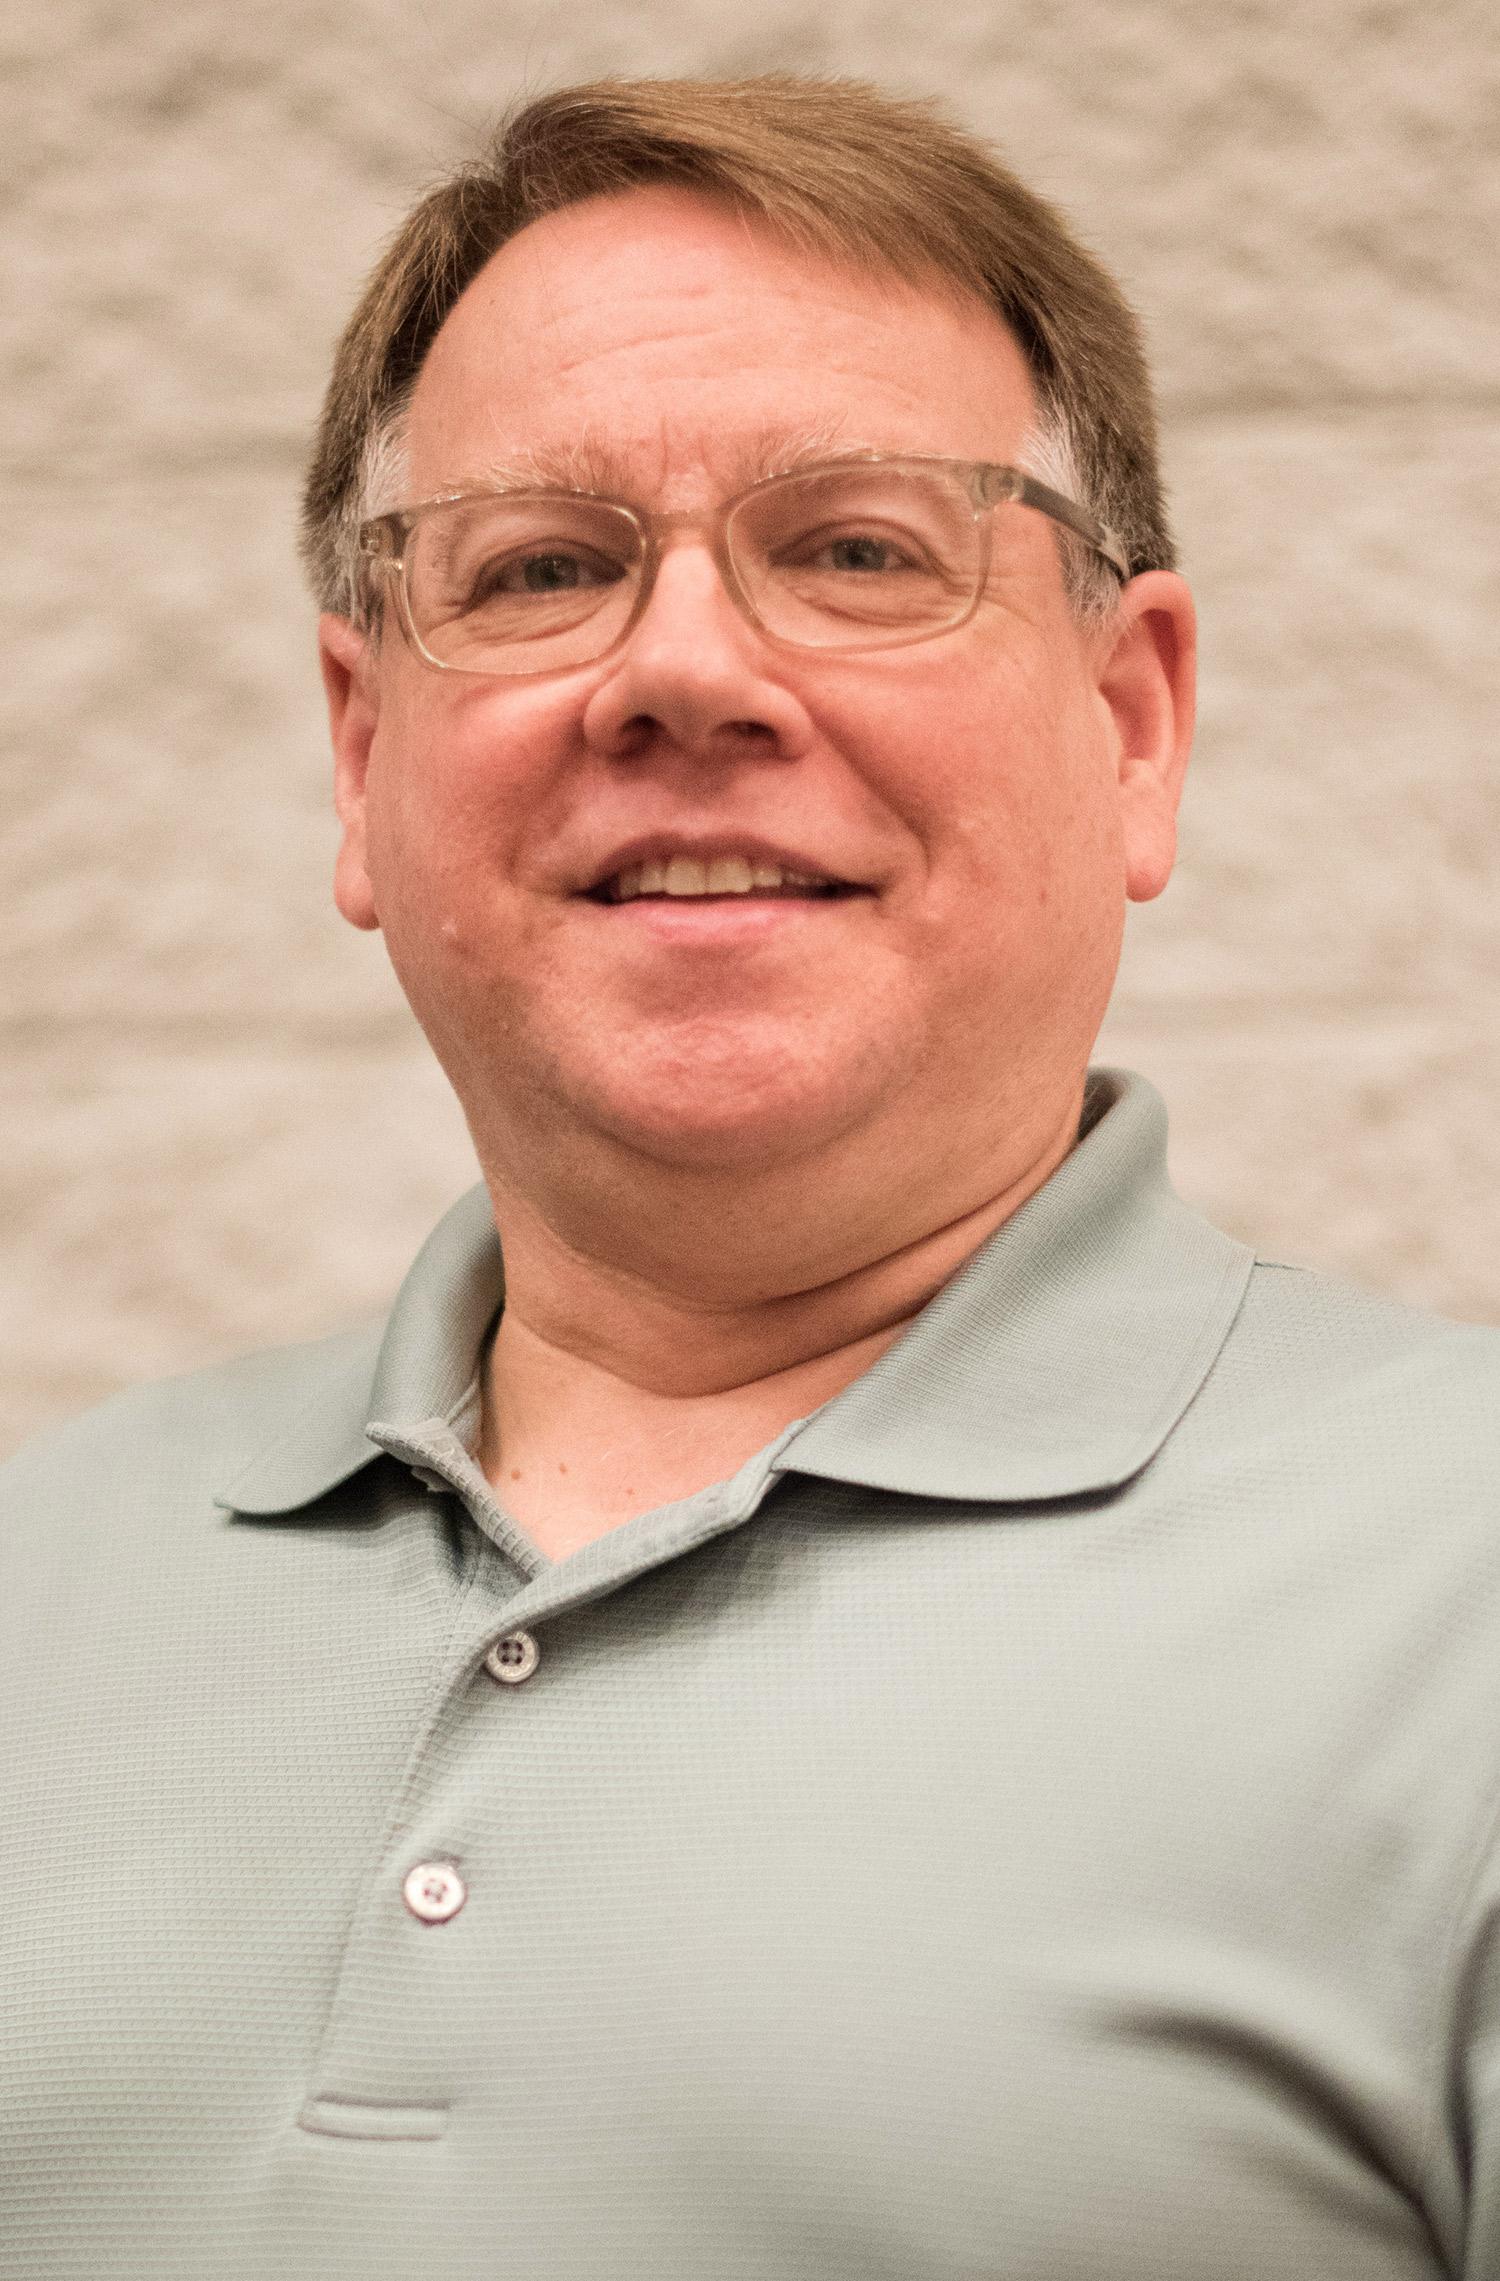 Jonathan Noffsinger